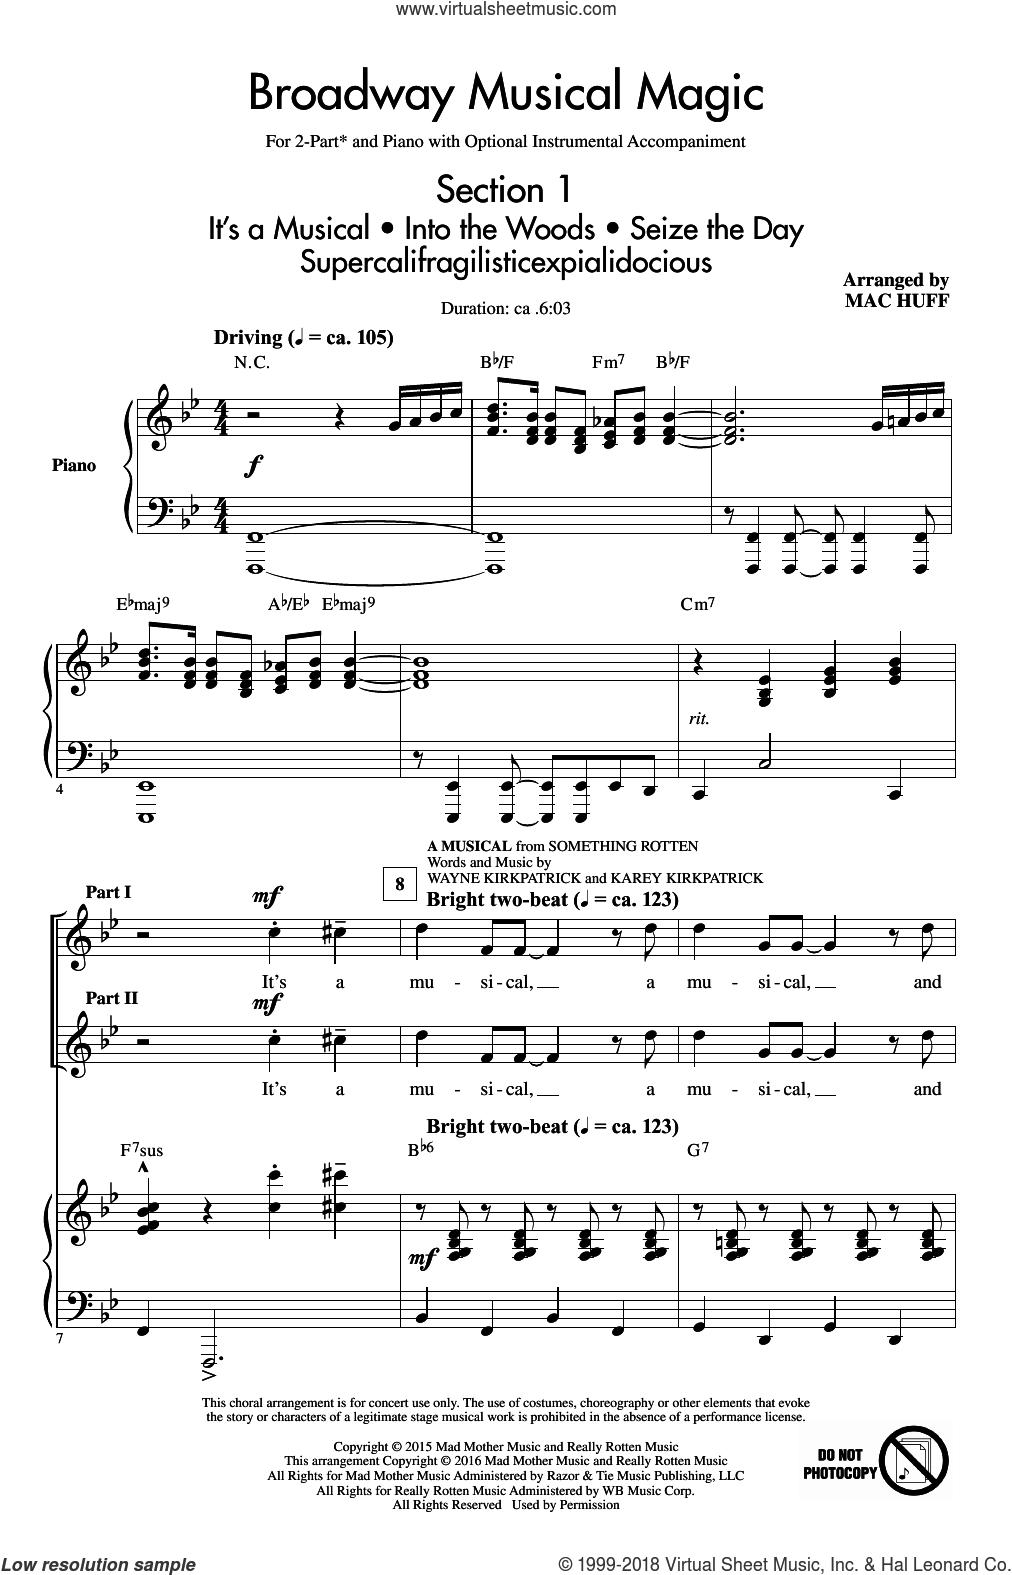 Broadway Musical Magic sheet music for choir (2-Part) by Jonathan Larson, Mac Huff and Cast of Rent, intermediate duet